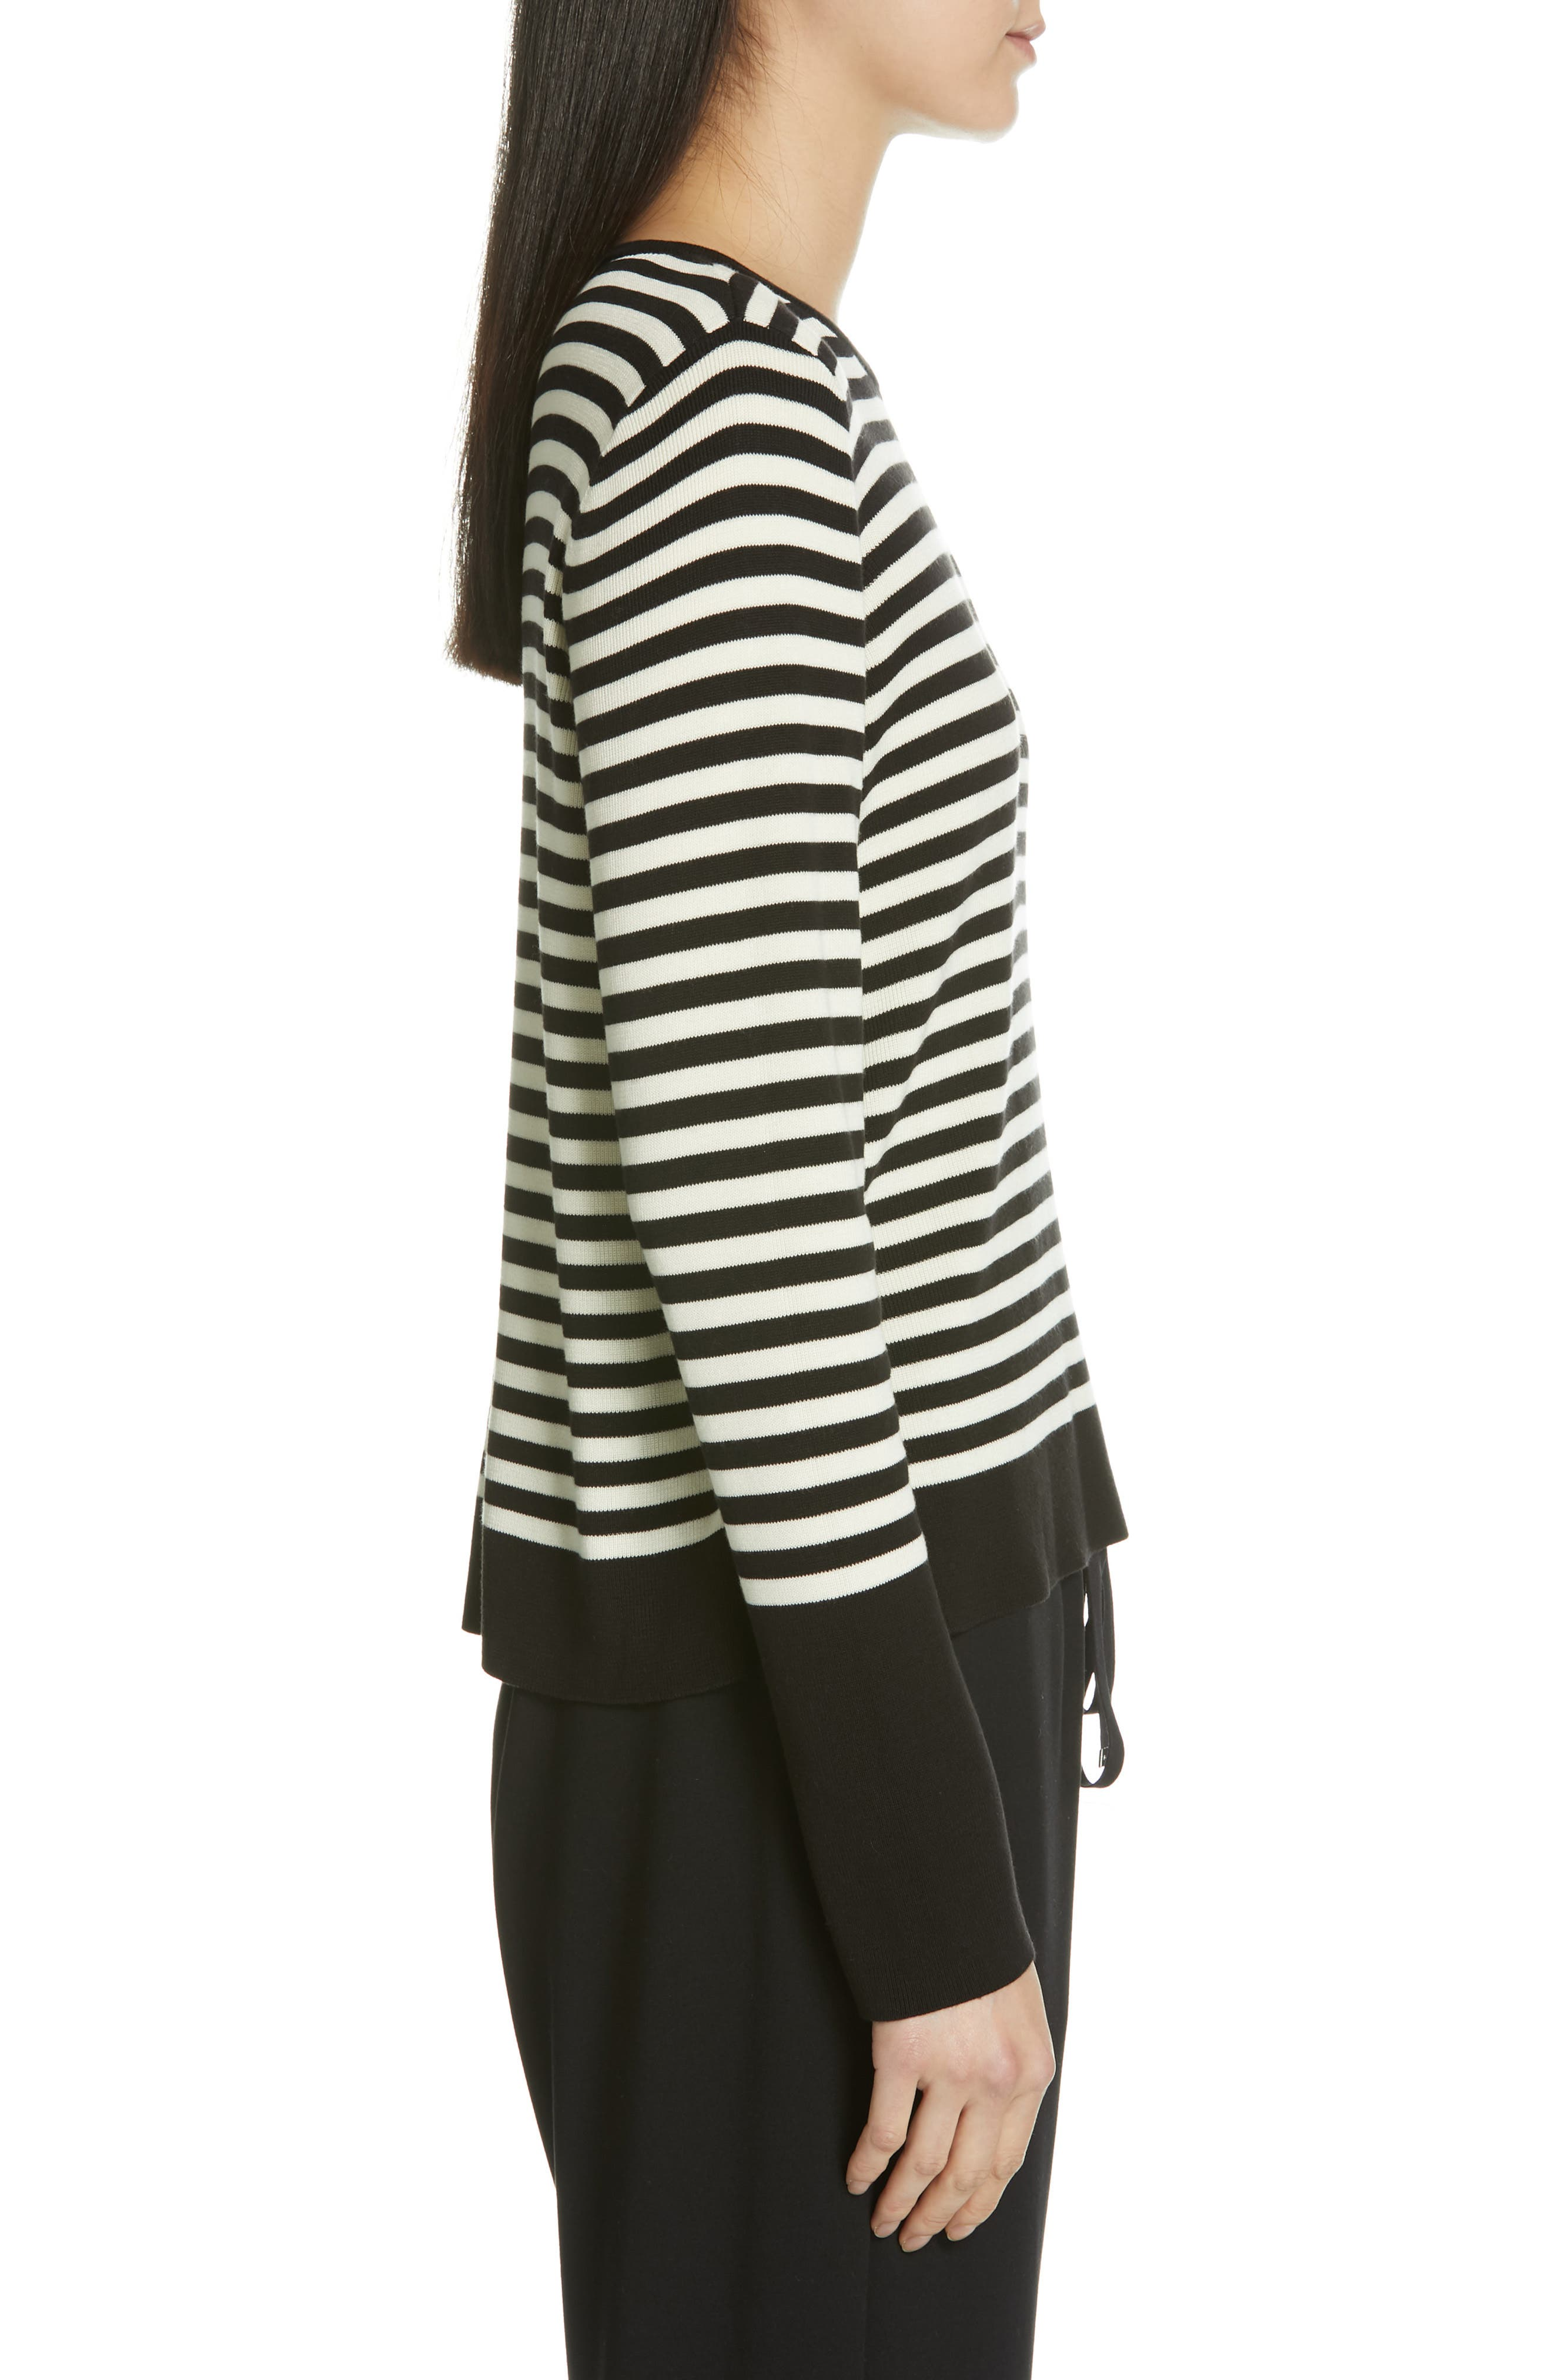 Tencel<sup>®</sup> Lyocell & Silk Sweater,                             Alternate thumbnail 3, color,                             BLACK/ SOFT WHITE